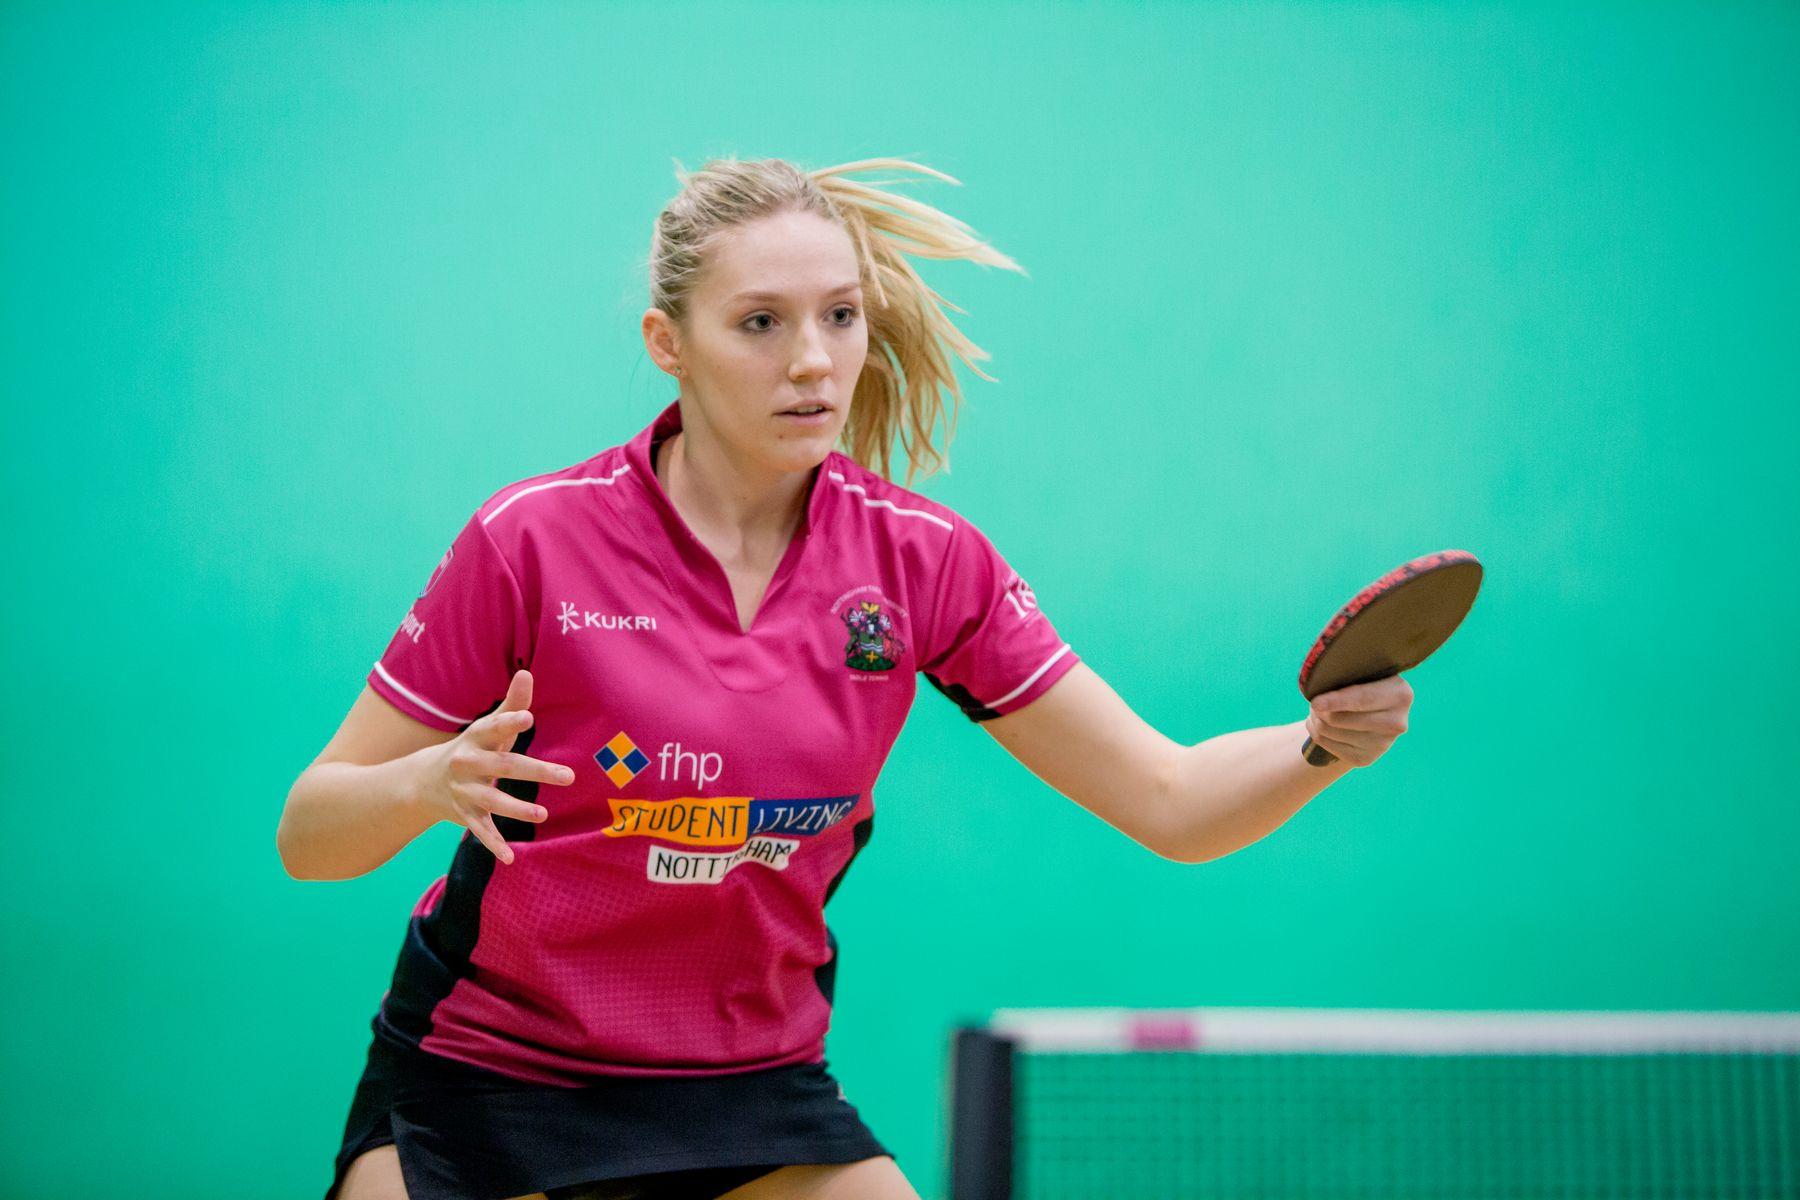 NTU Women's Table Tennis Player Hits a return shot